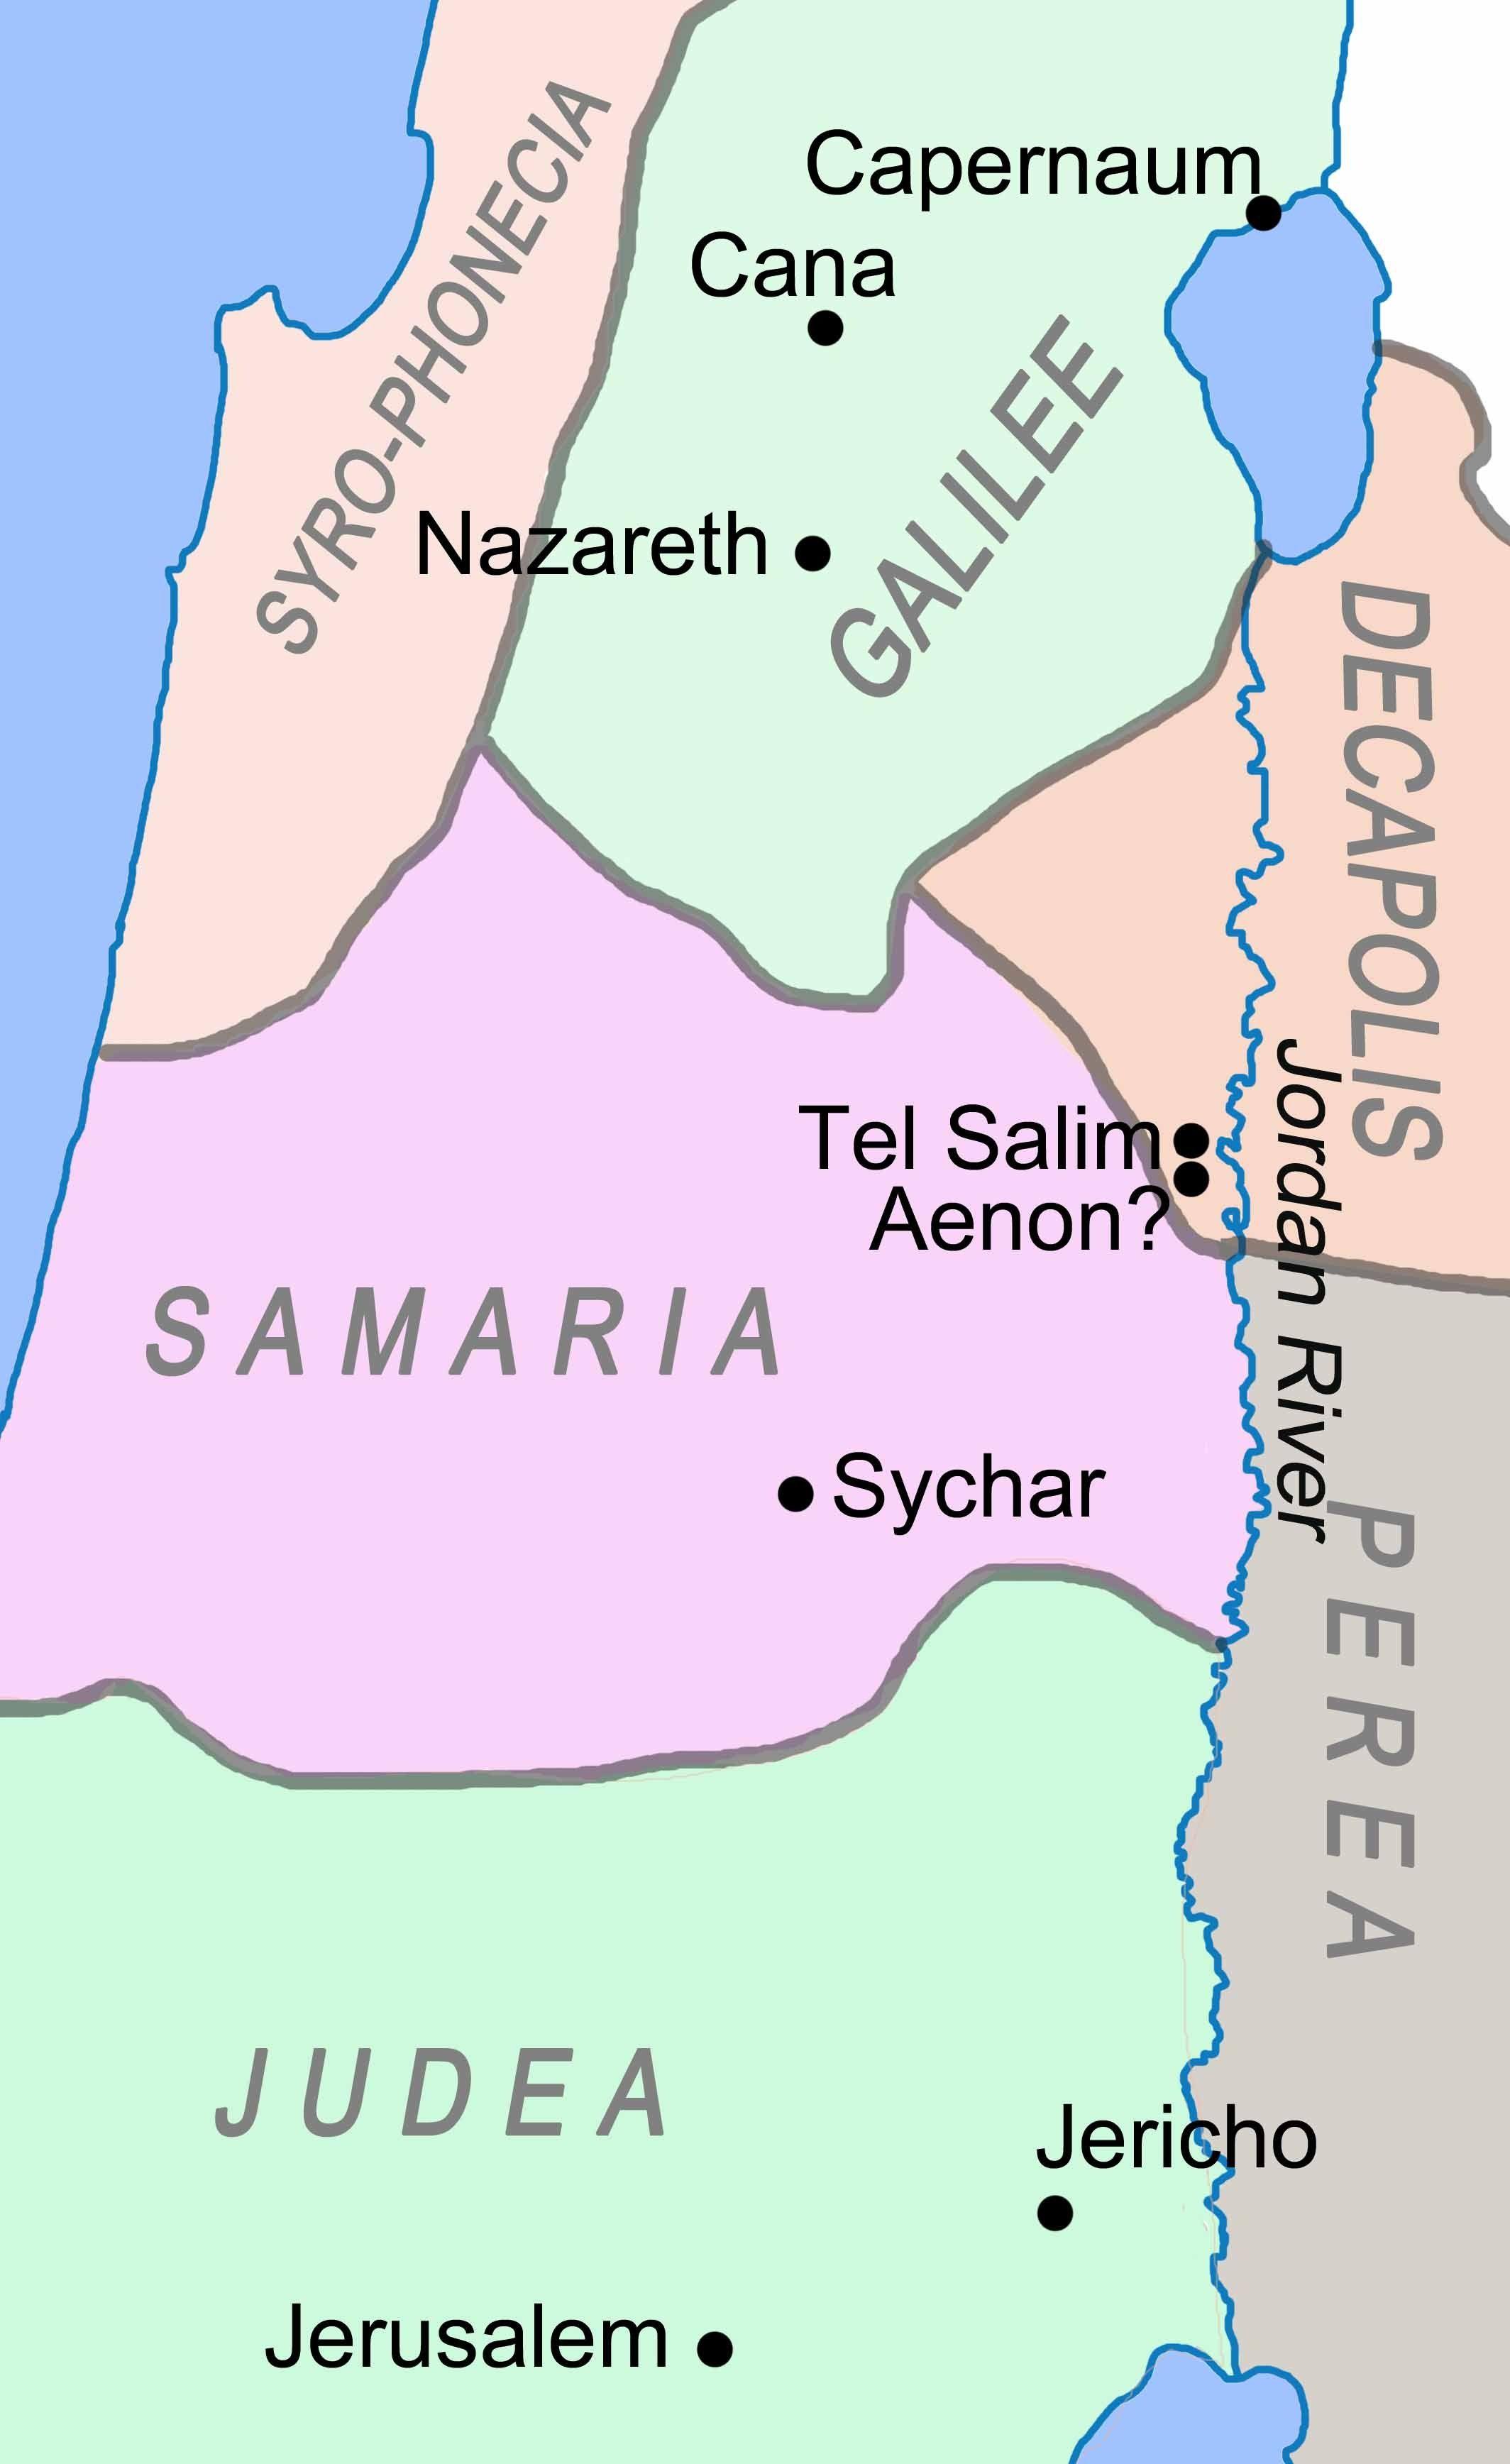 The Samaritan Woman at the Well (John 4:4-26) | Bible Maps and ...